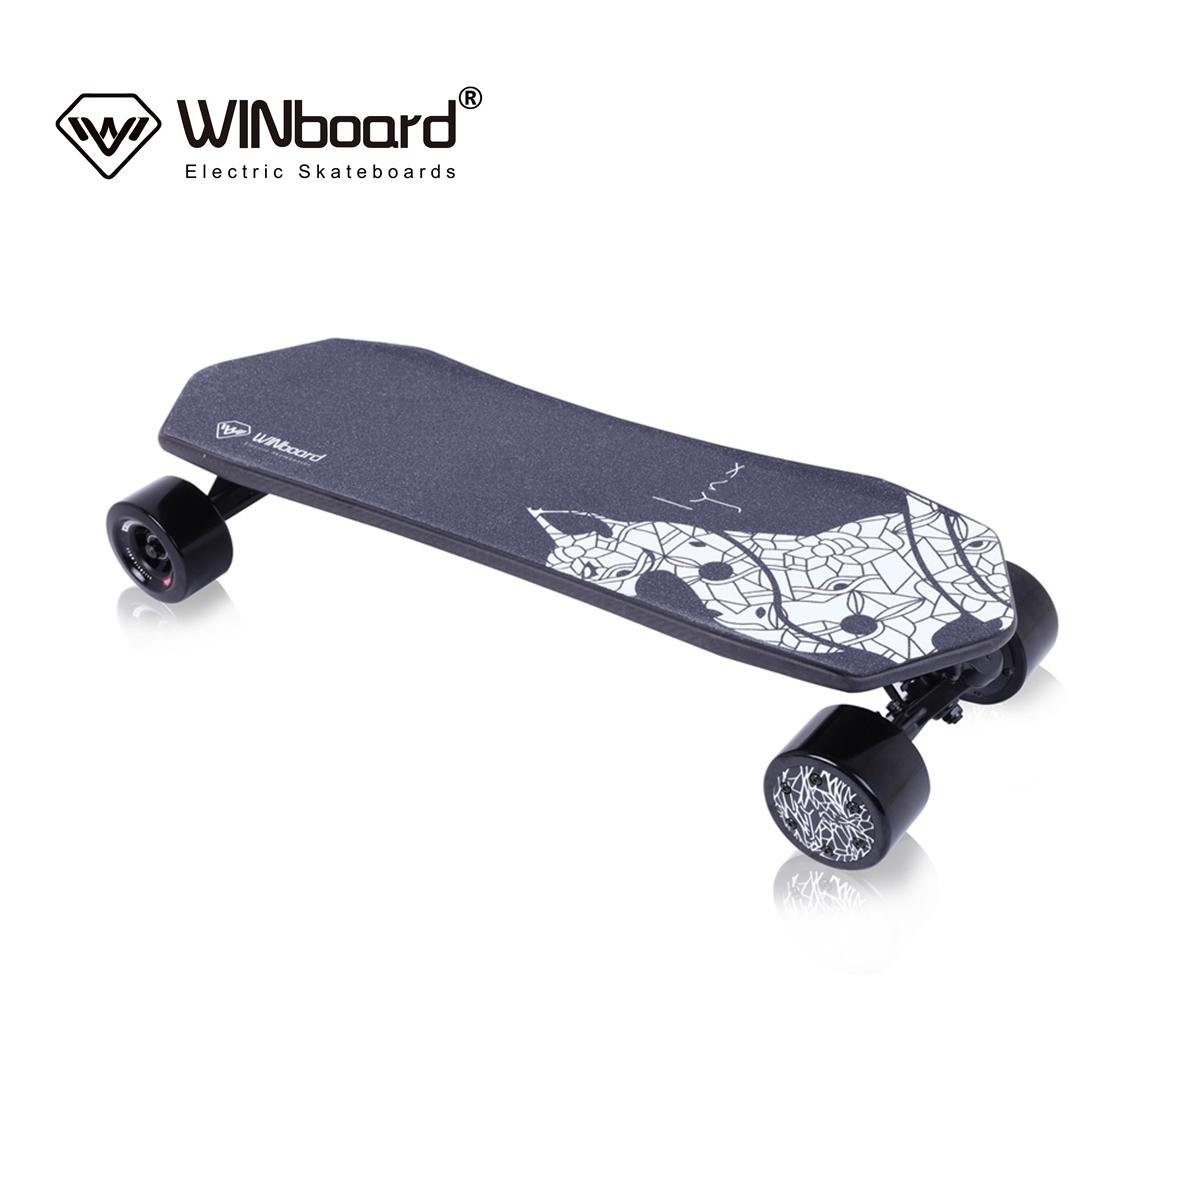 WINboard factory wholesale carbon fiber 85mm hub motor four wheels remote control electric skateboard